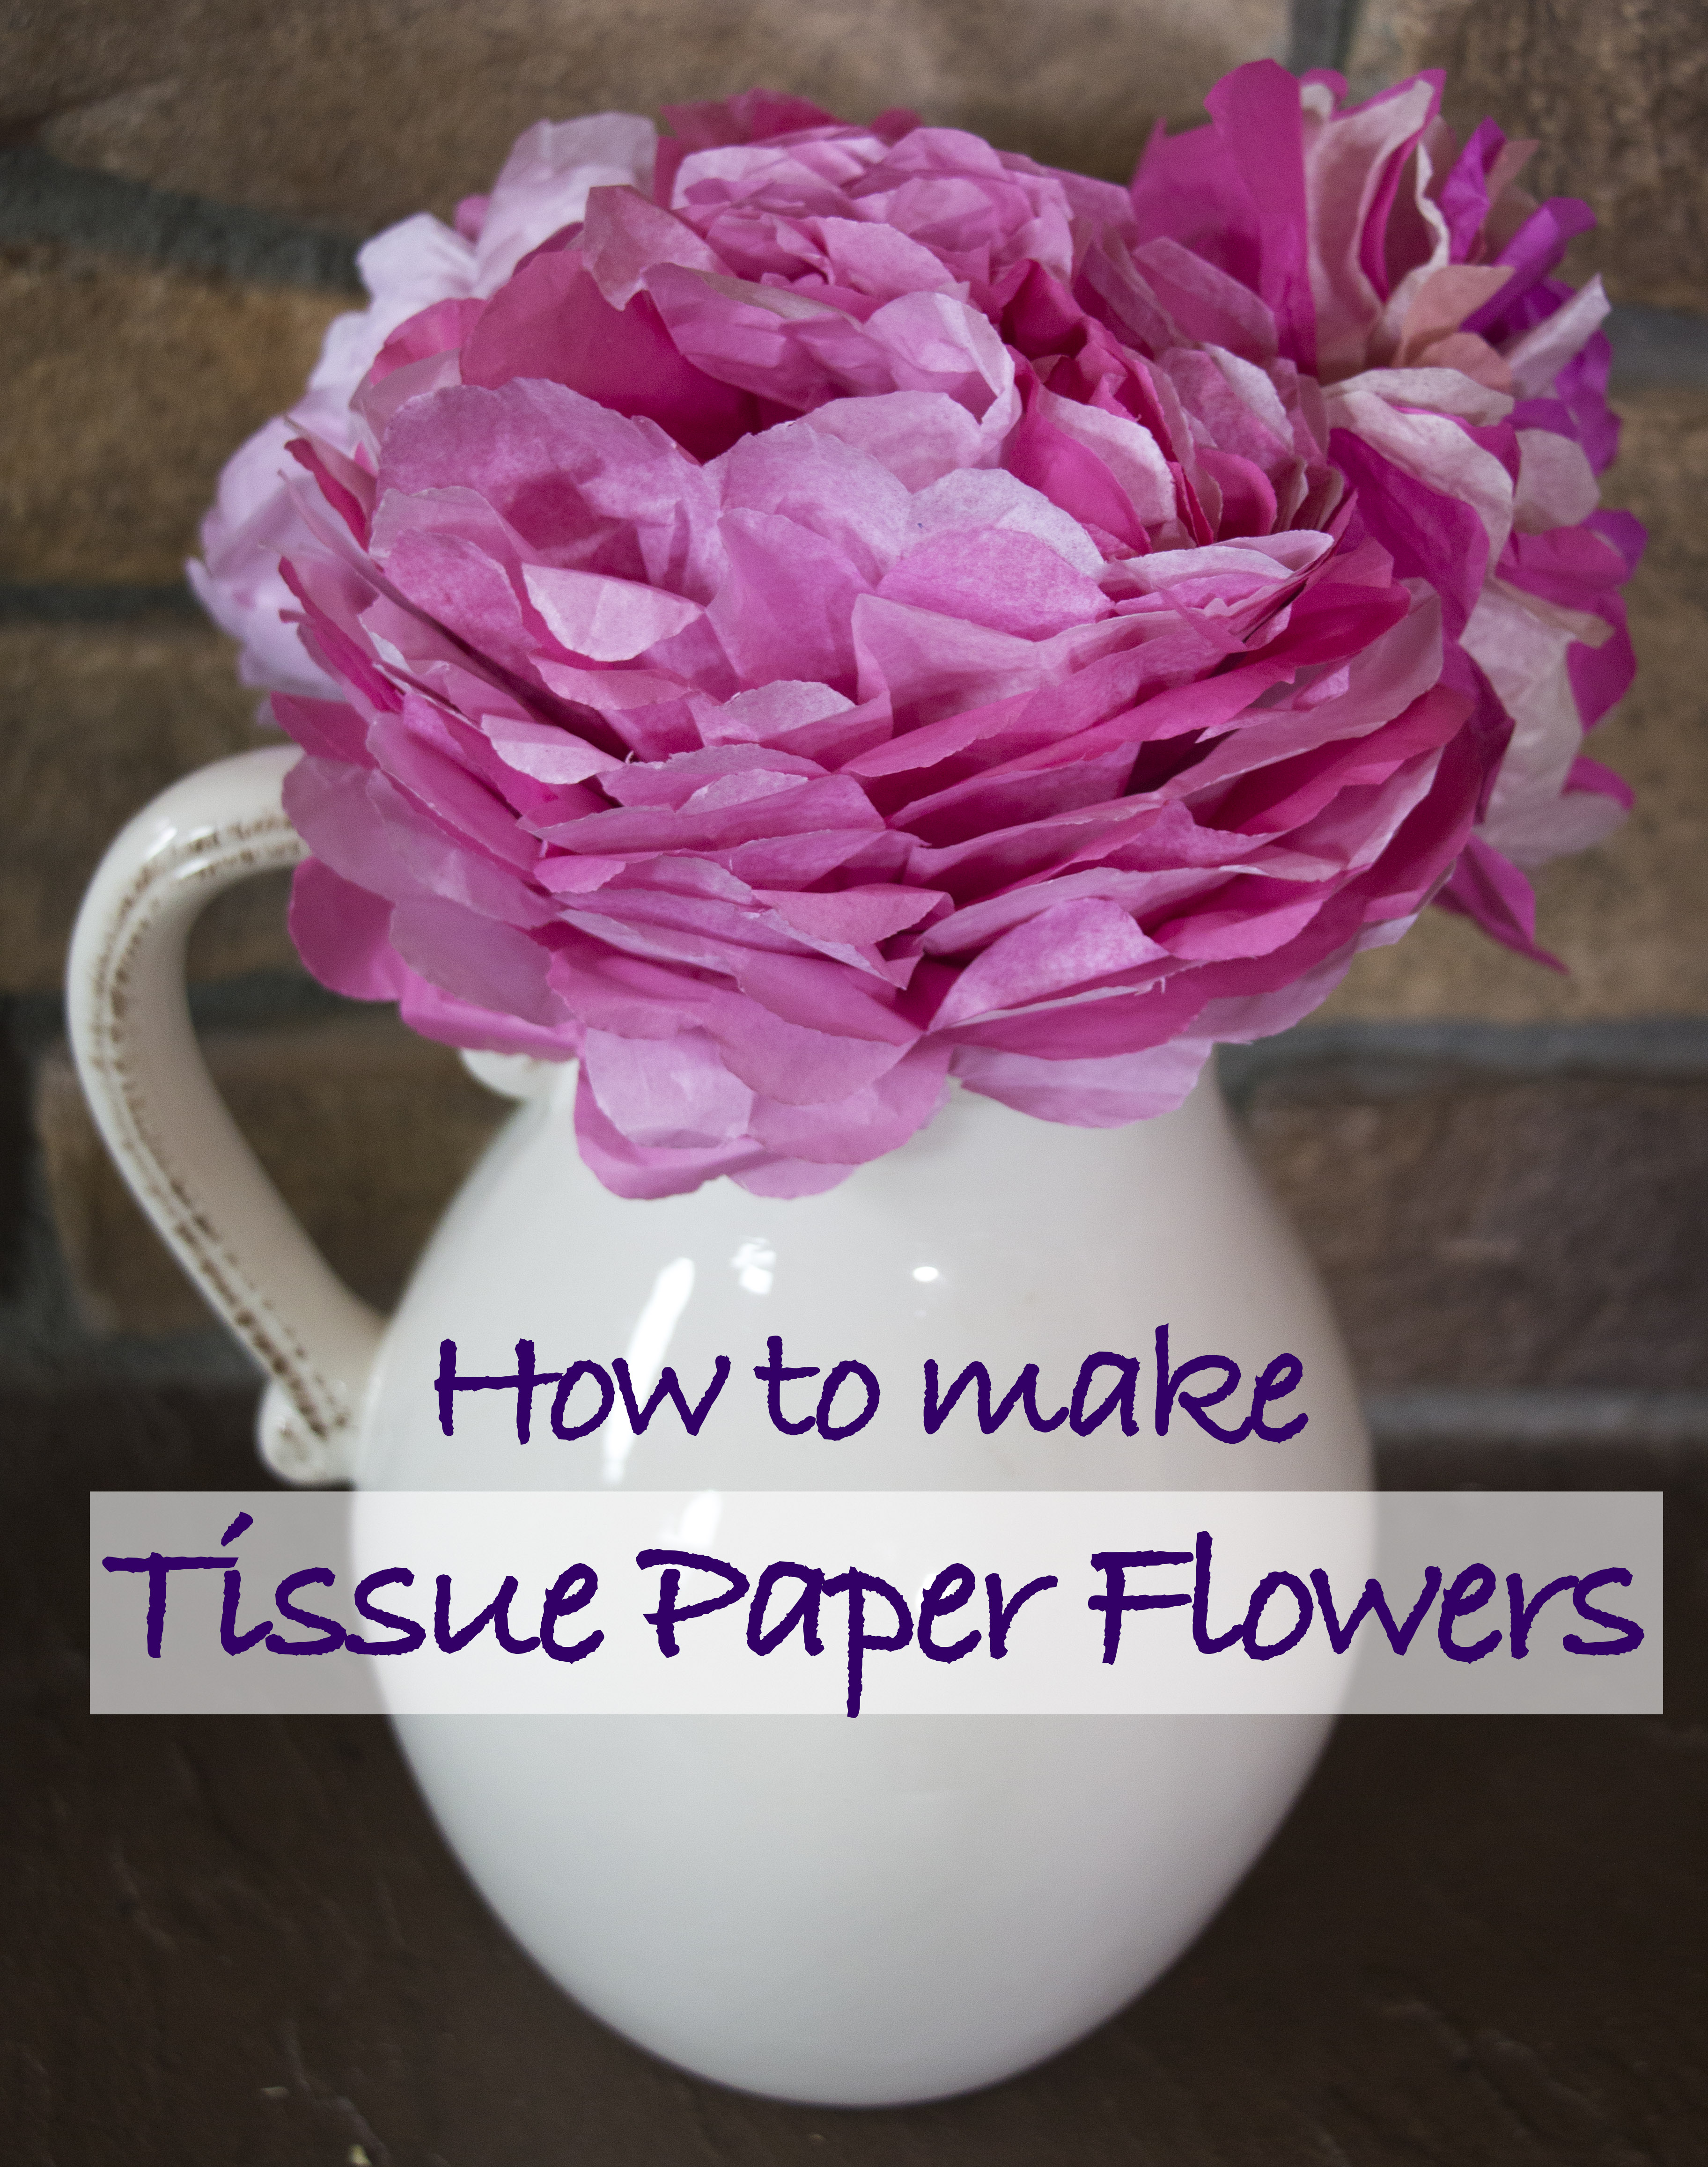 Diy Tissue Paper Flower Tutorial Moosemischief